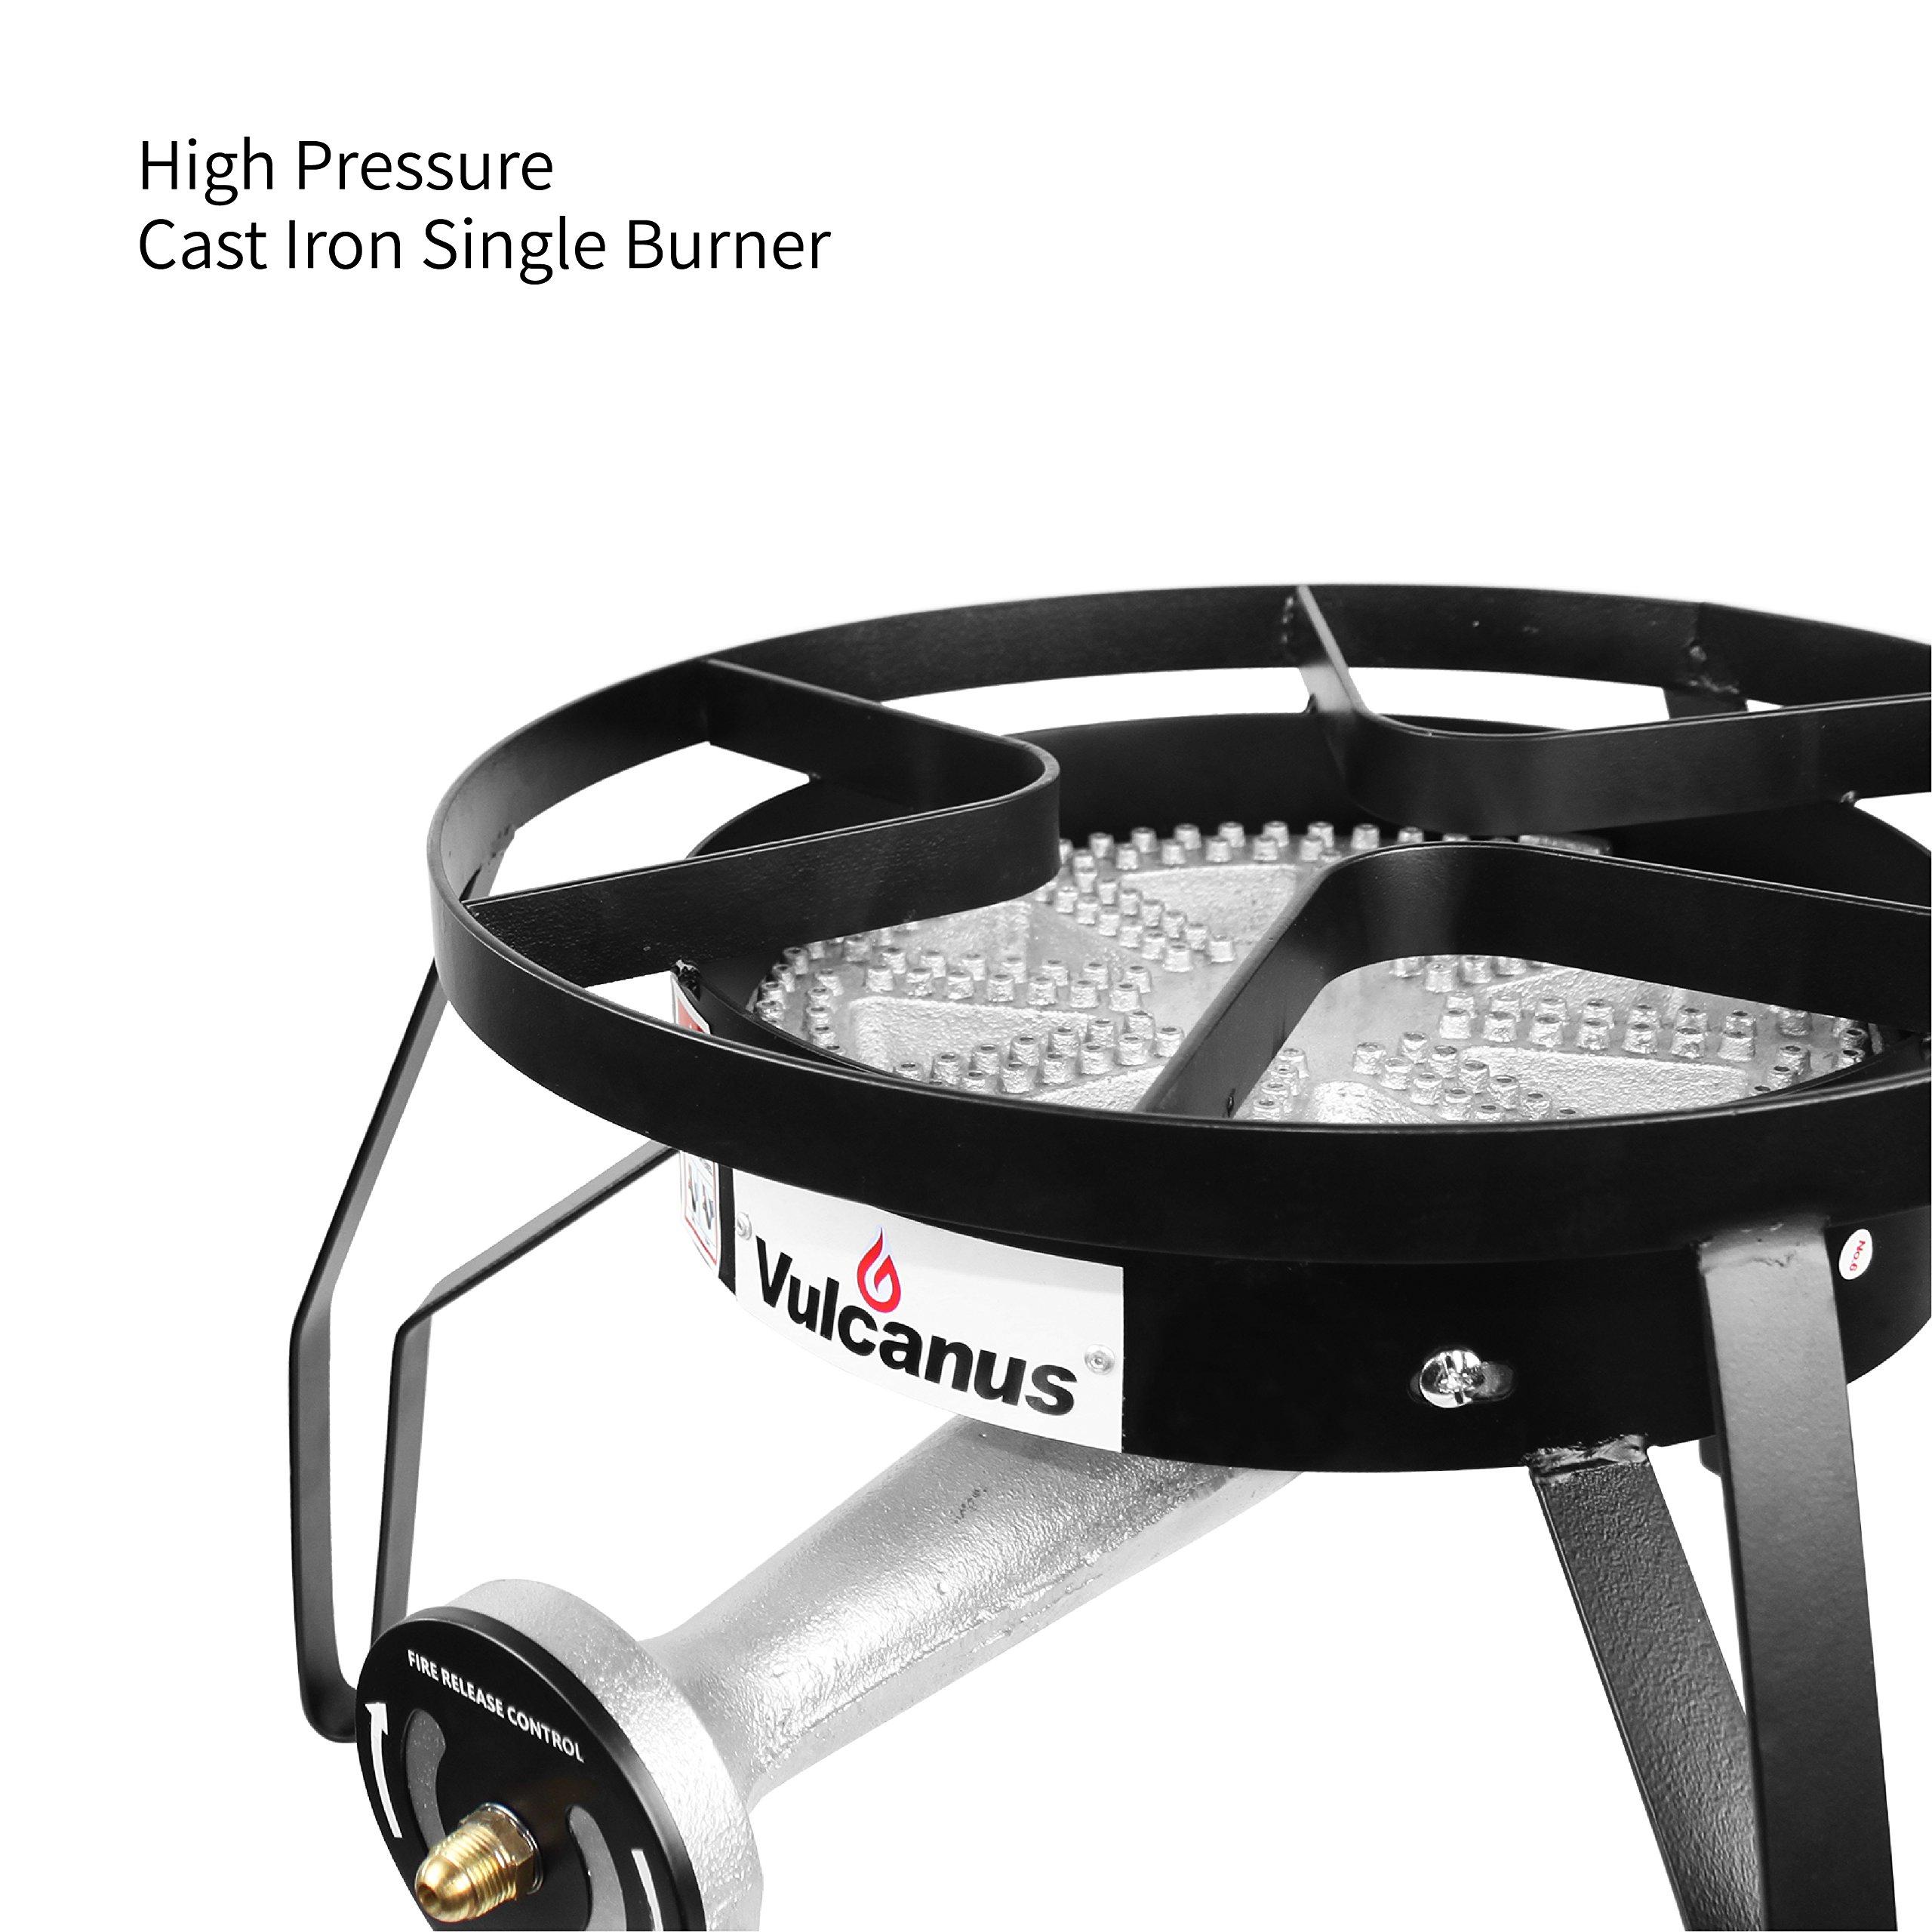 Vulcanus 2-11H High Pressure cast Iron Super Burner with CSA Propane Regulator and Hose. 20 PSI by Vulcanus (Image #3)